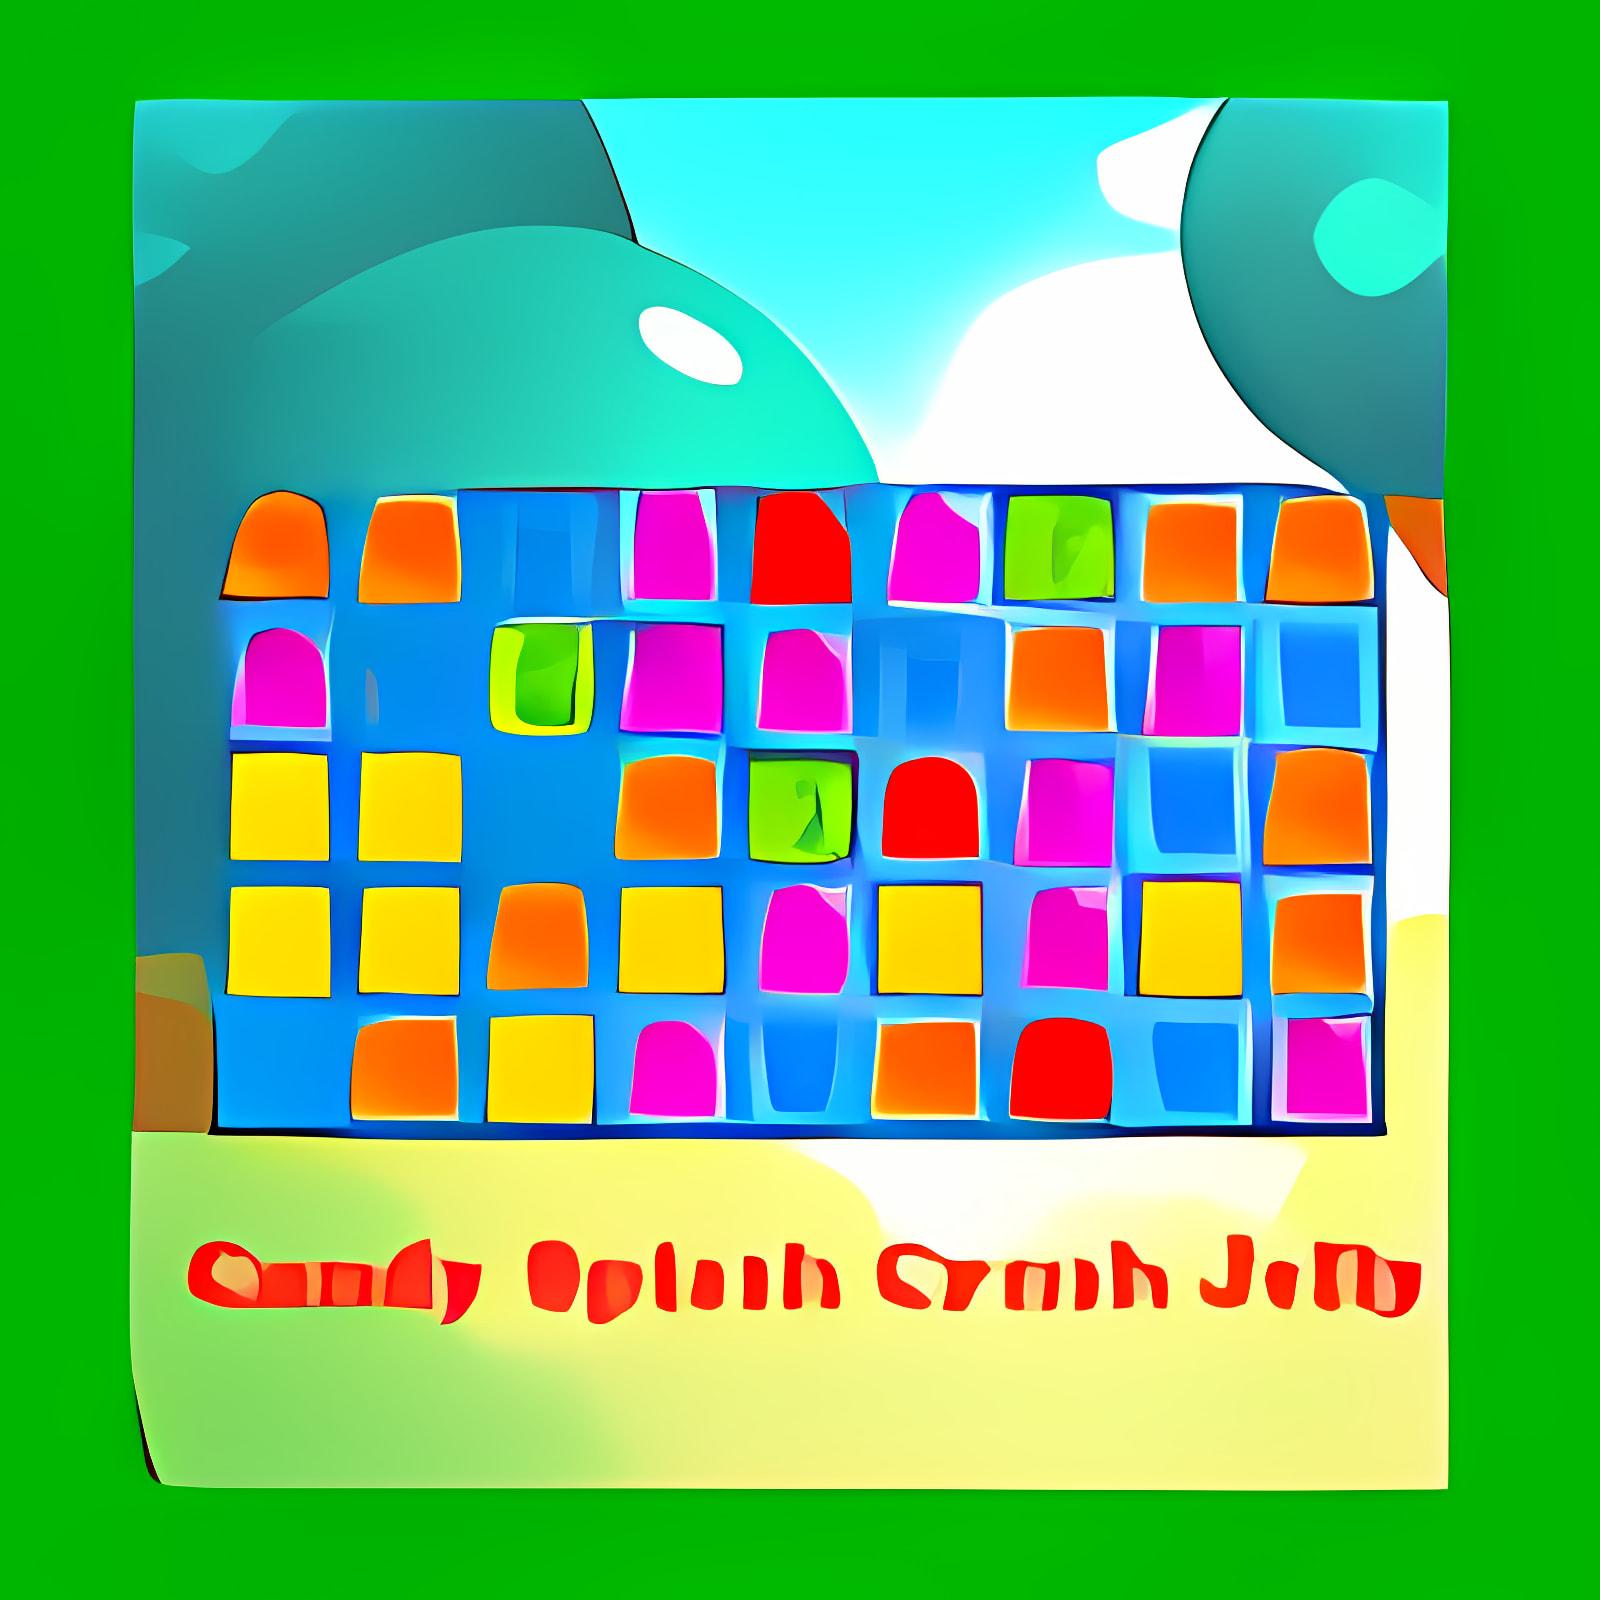 Candy Splash Crush Jelly Game